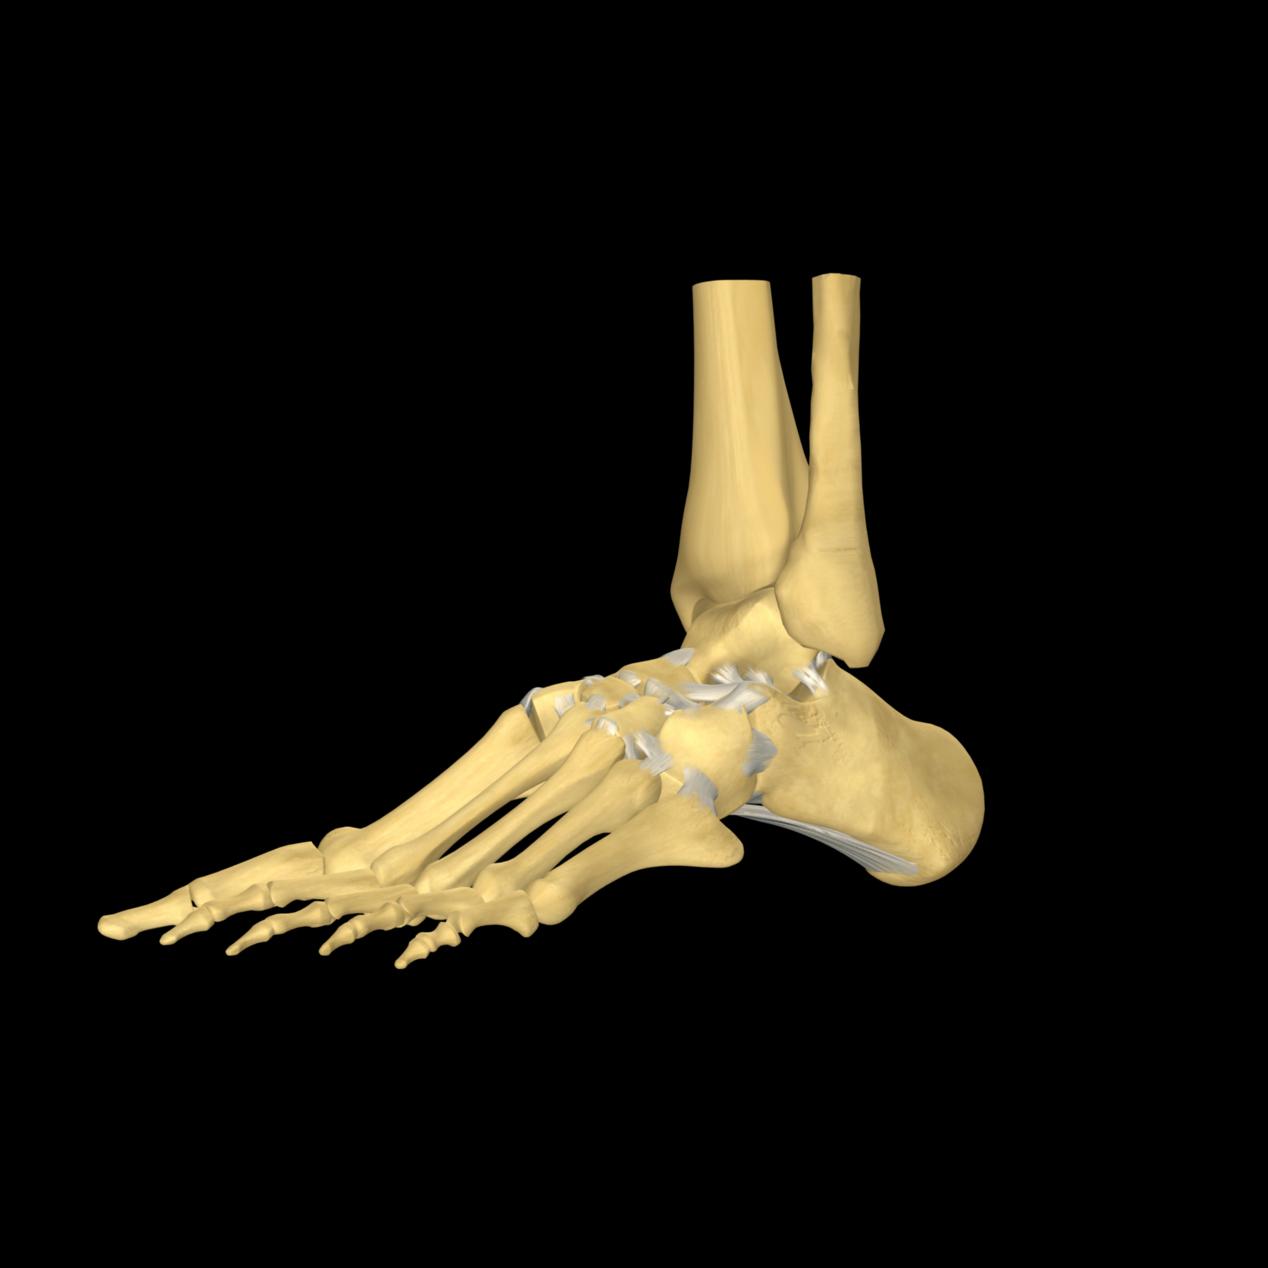 anatomyEXPERT - Posterior talocalcaneal ligament - Structure Detail